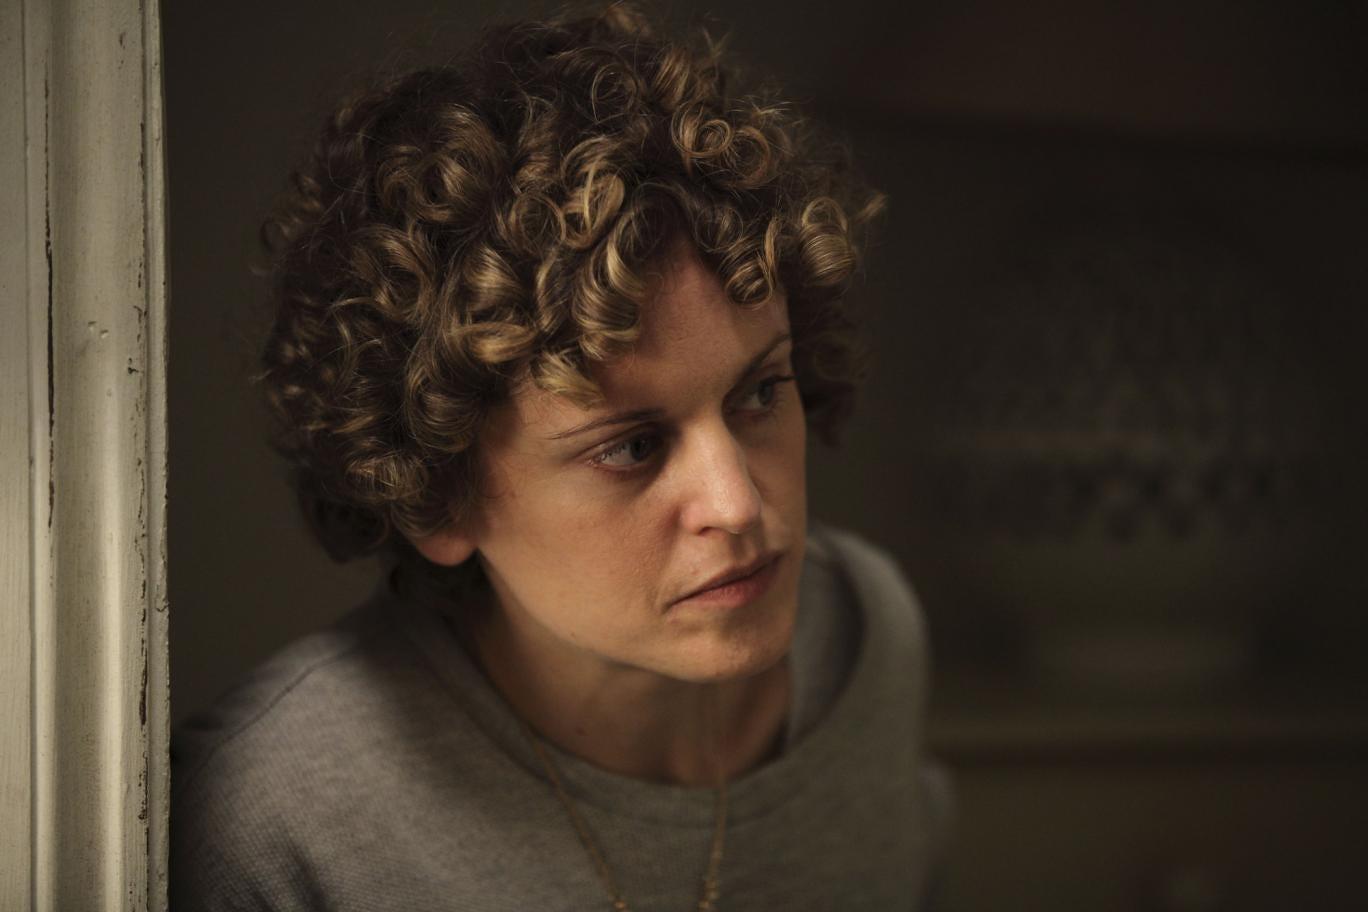 Liz Fletcher (Denise Gough) in What Remains